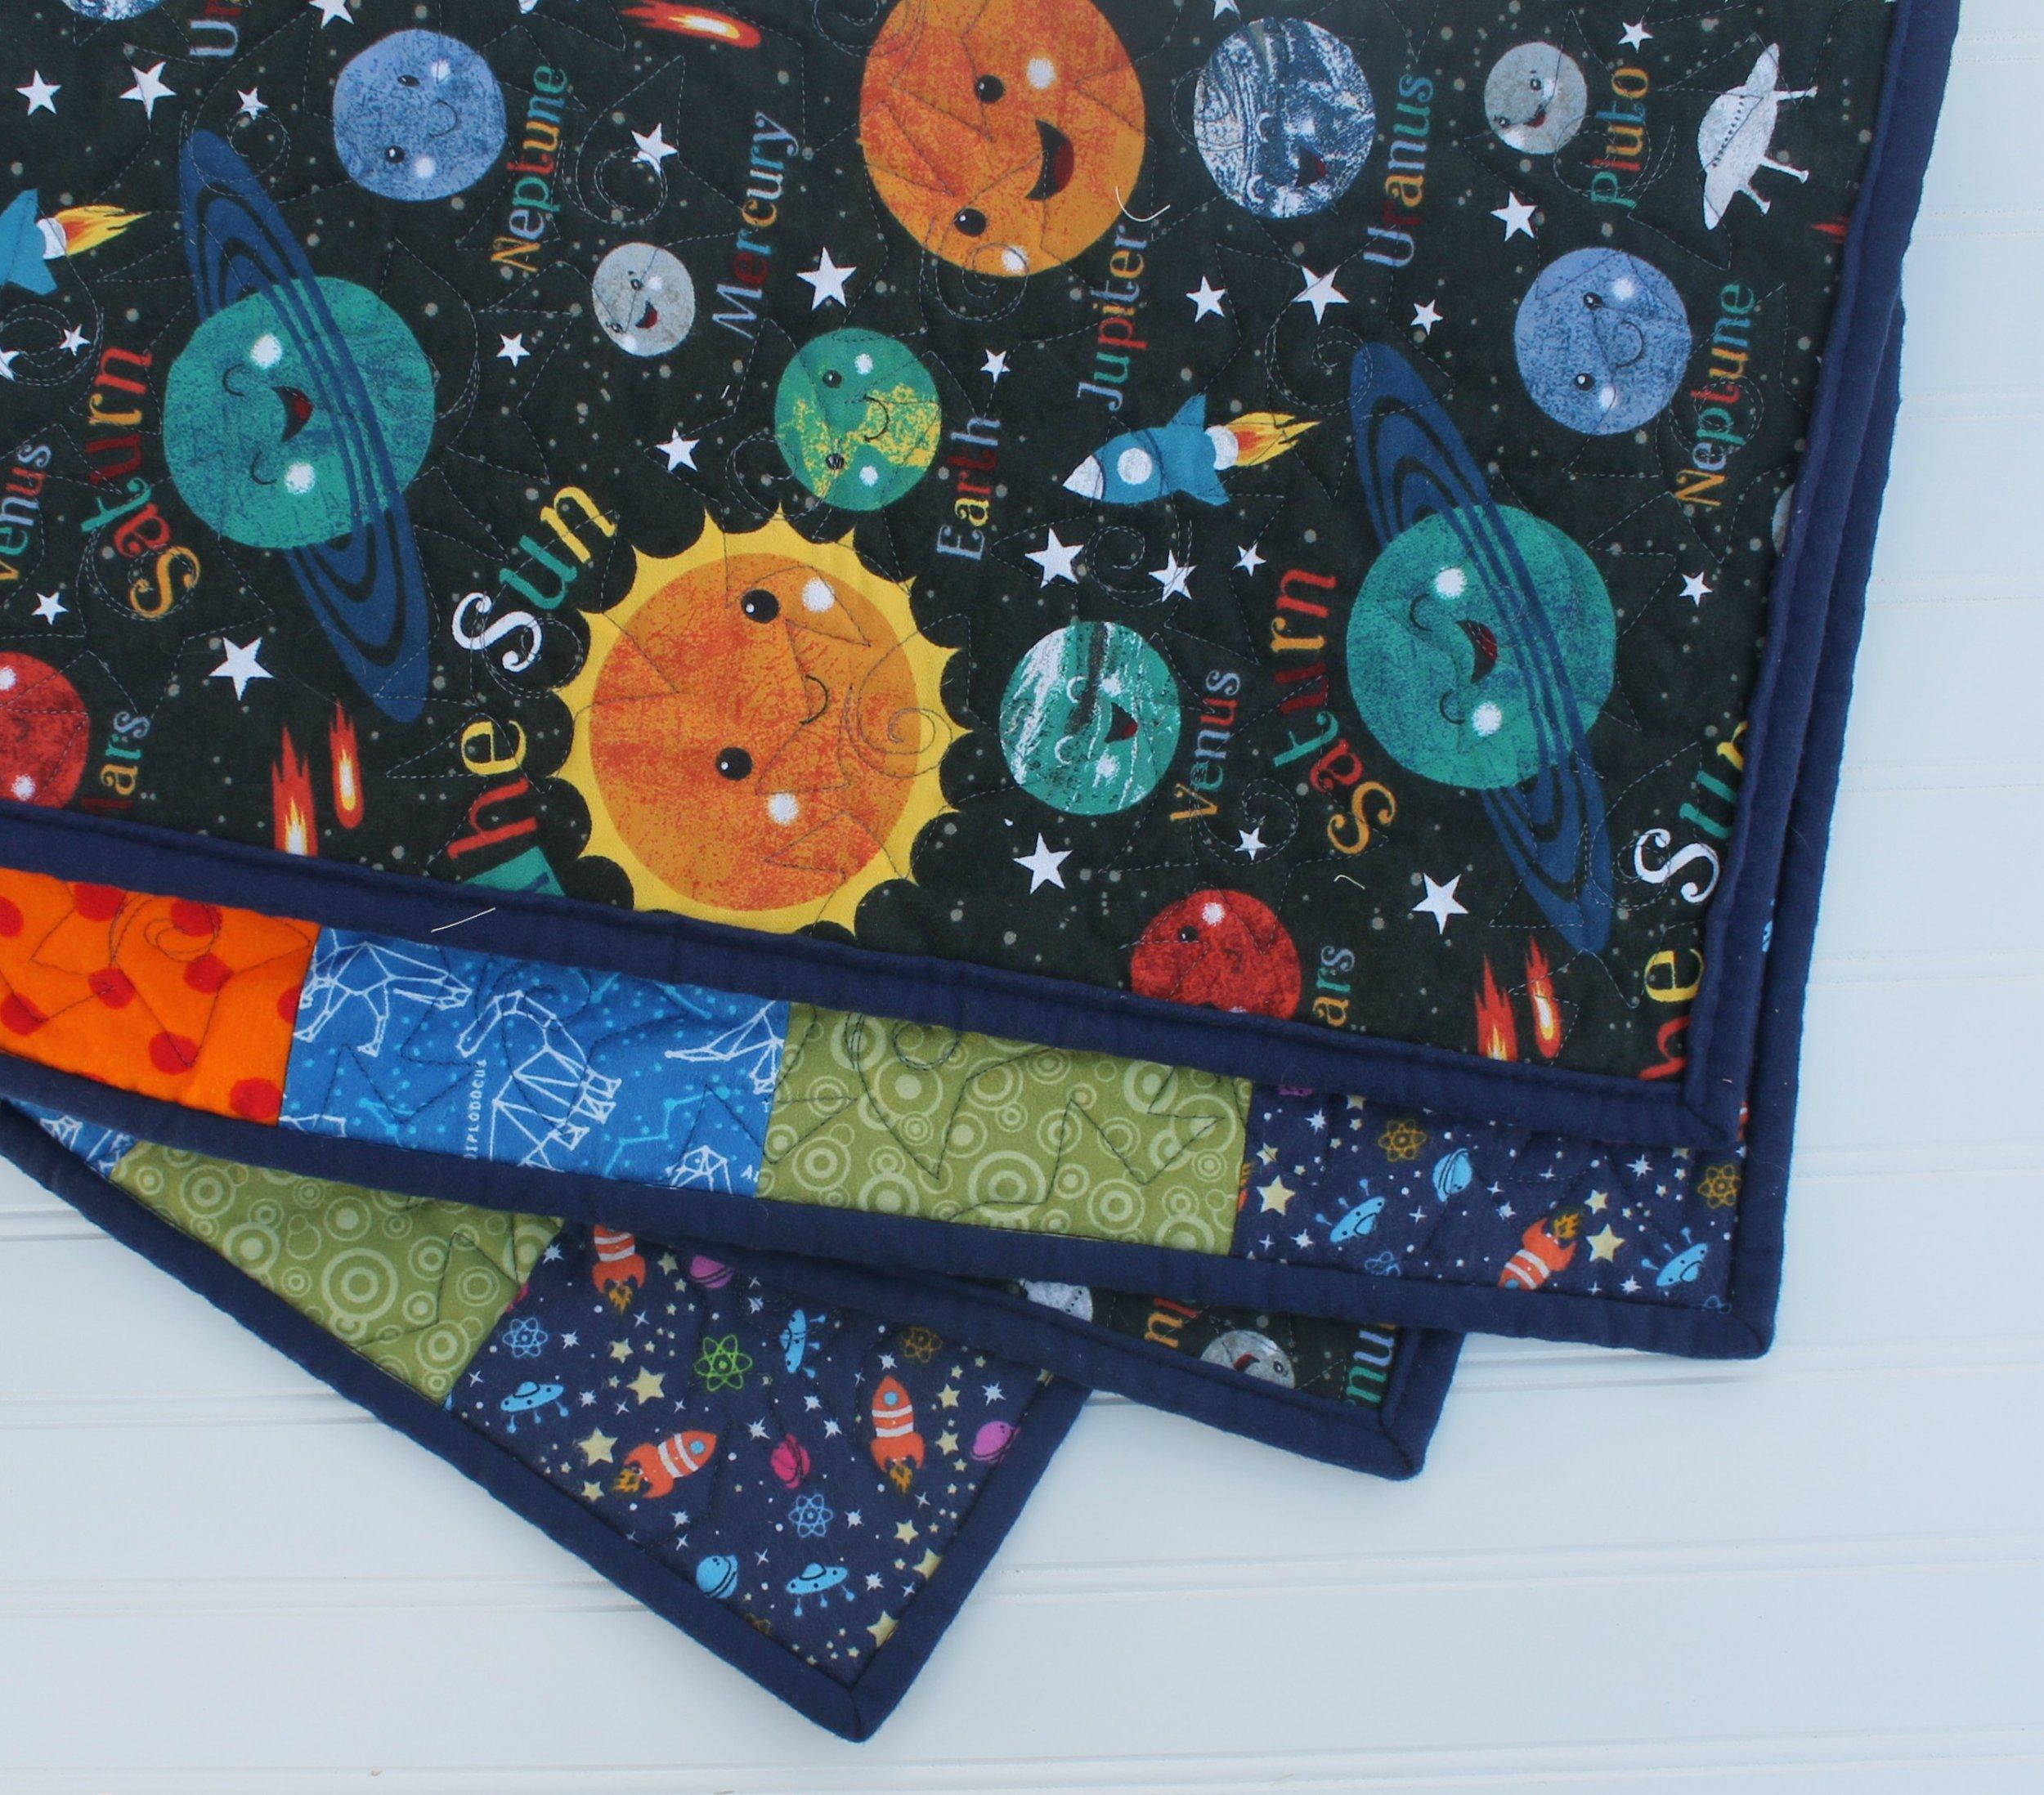 space_flannel_quilt4.jpg